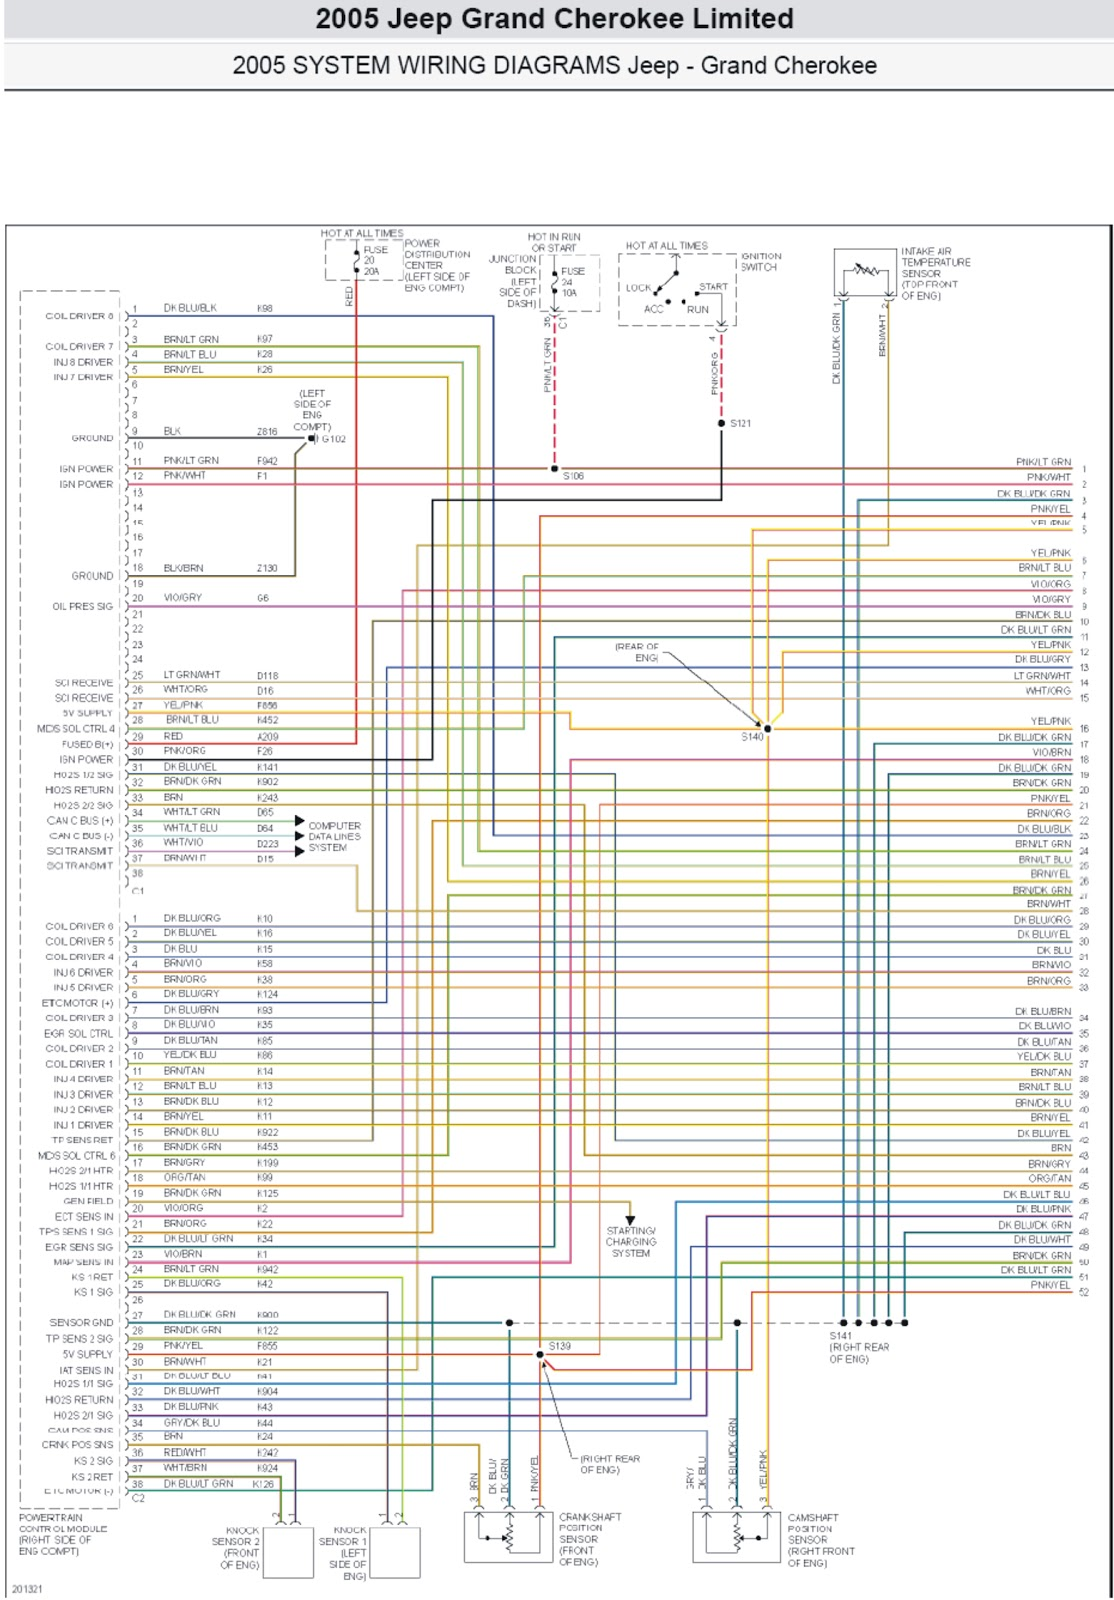 Astounding dodge grand caravan radio wiring diagram ideas best wonderful 99 dodge grand caravan radio wiring diagram contemporary cheapraybanclubmaster Image collections